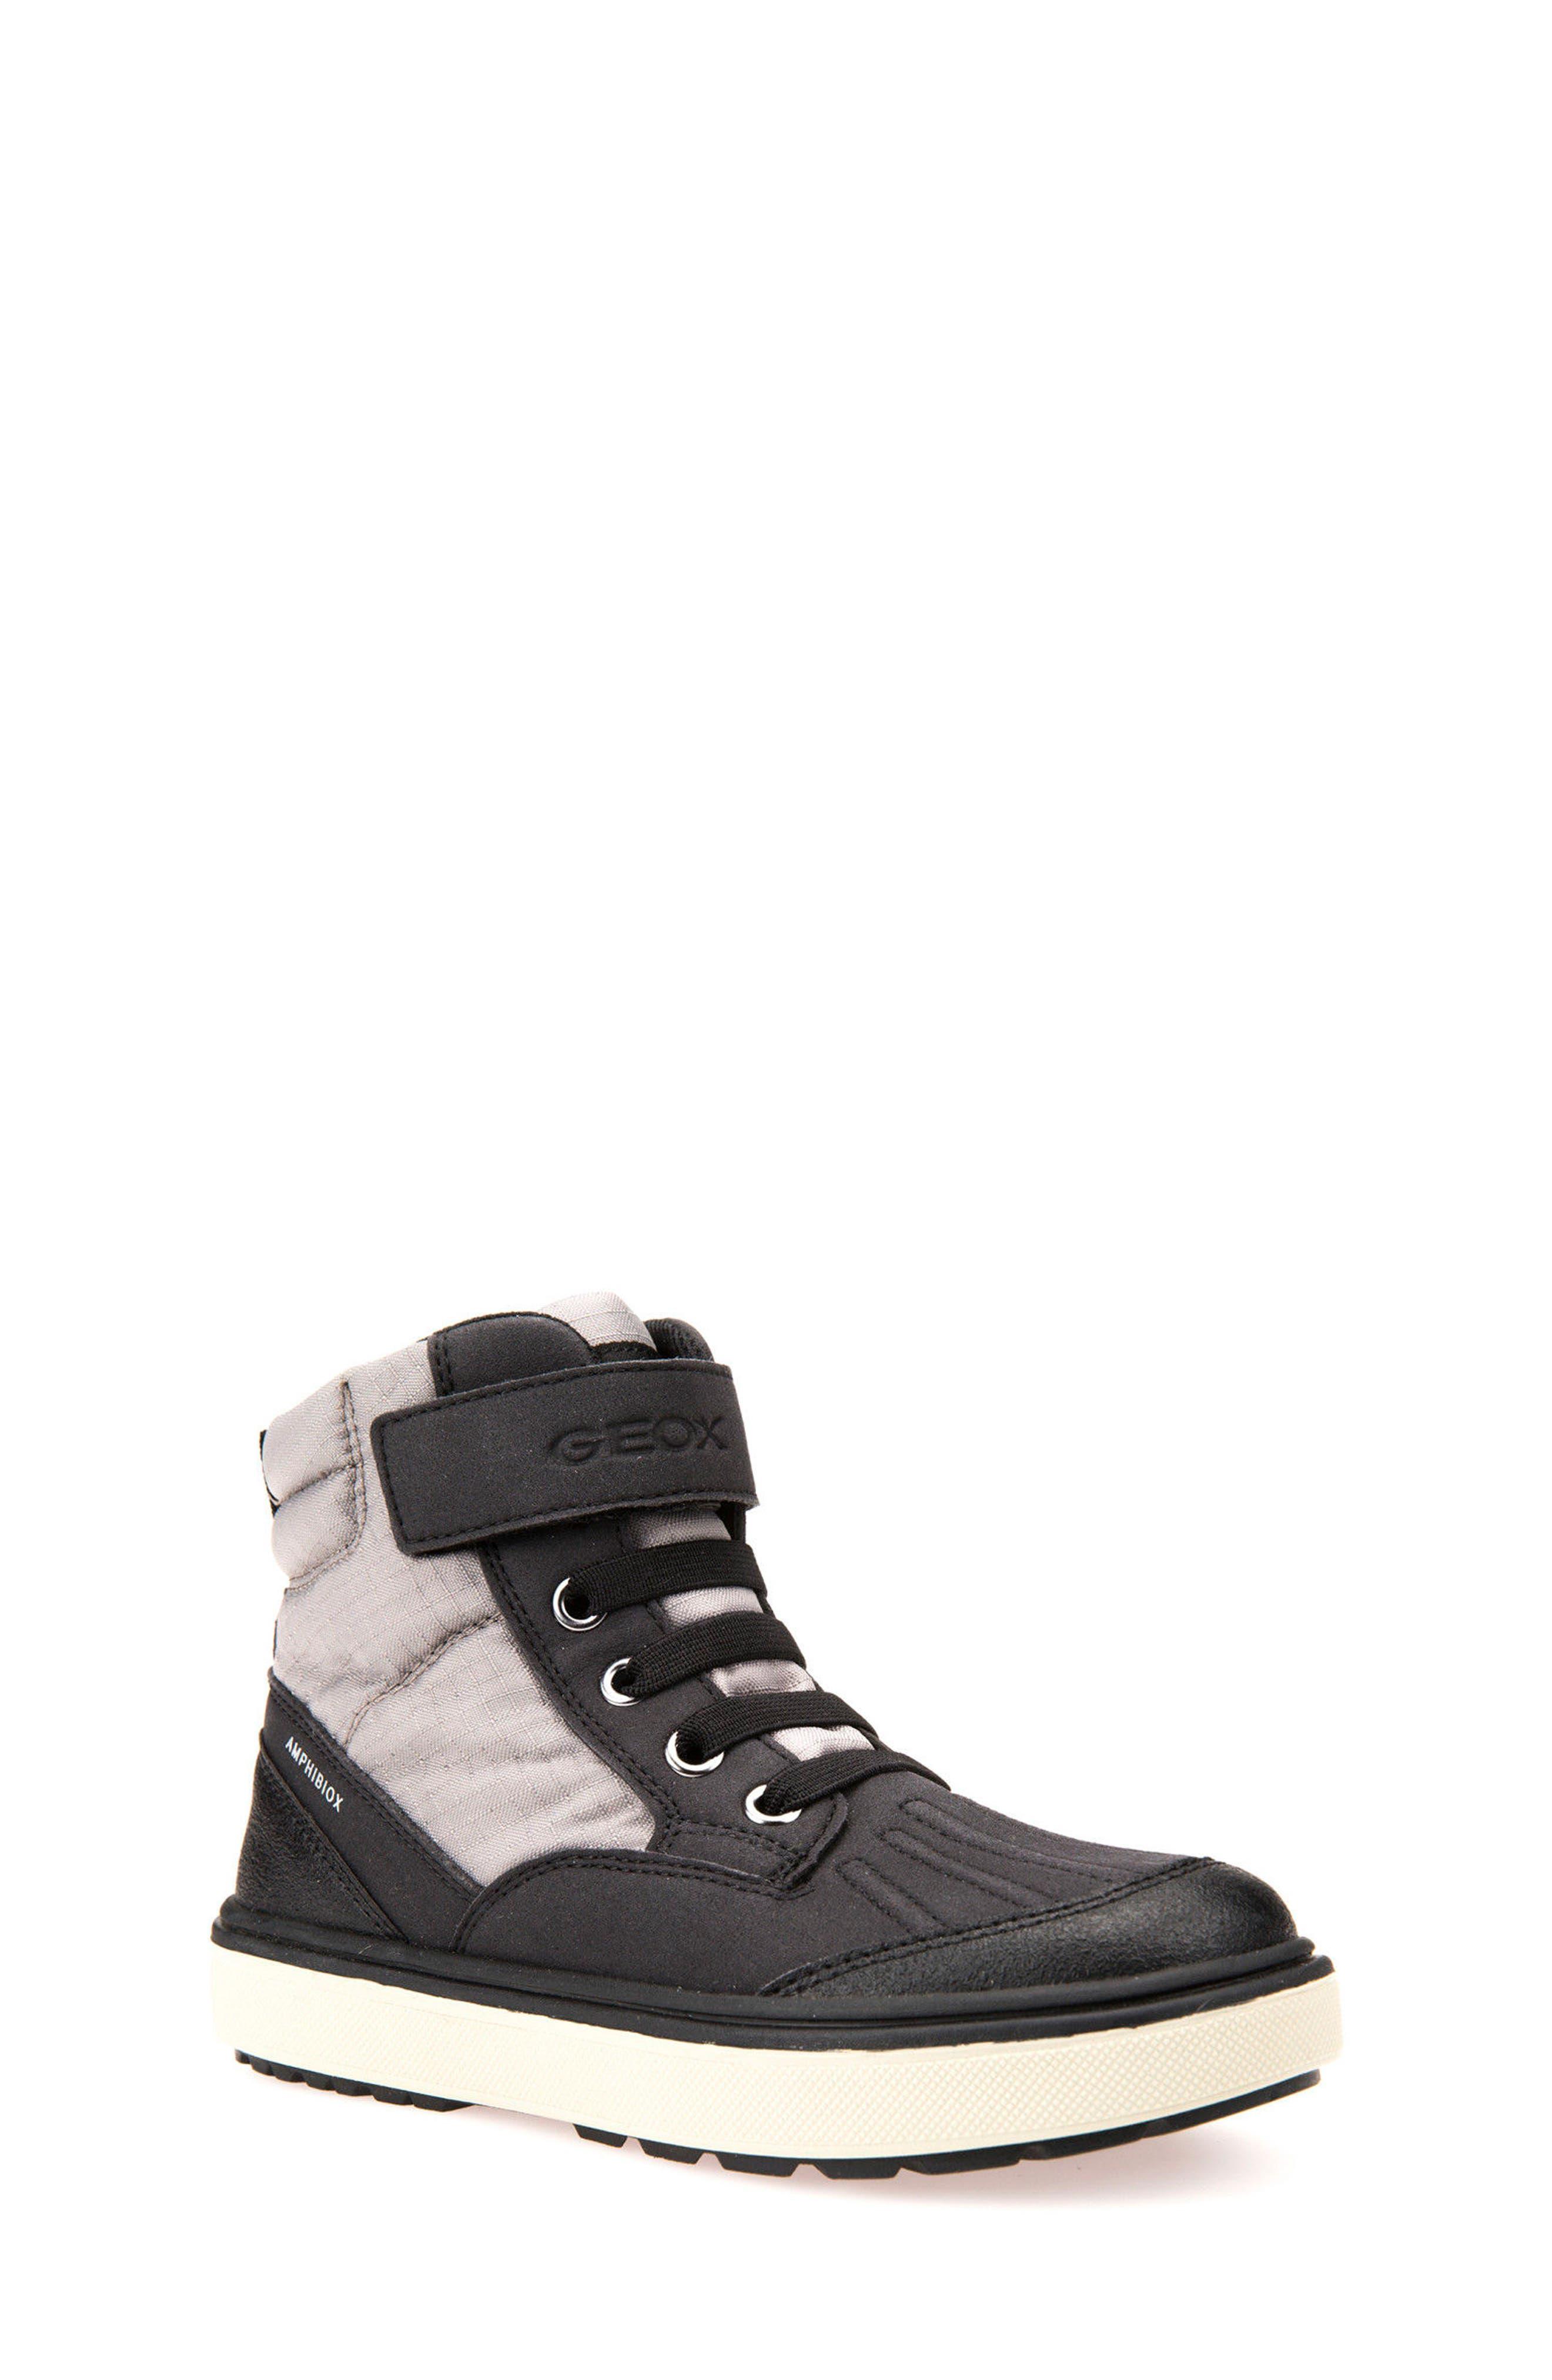 'Mattias - ABX' Amphibiox<sup>®</sup> Waterproof Sneaker,                         Main,                         color, 061